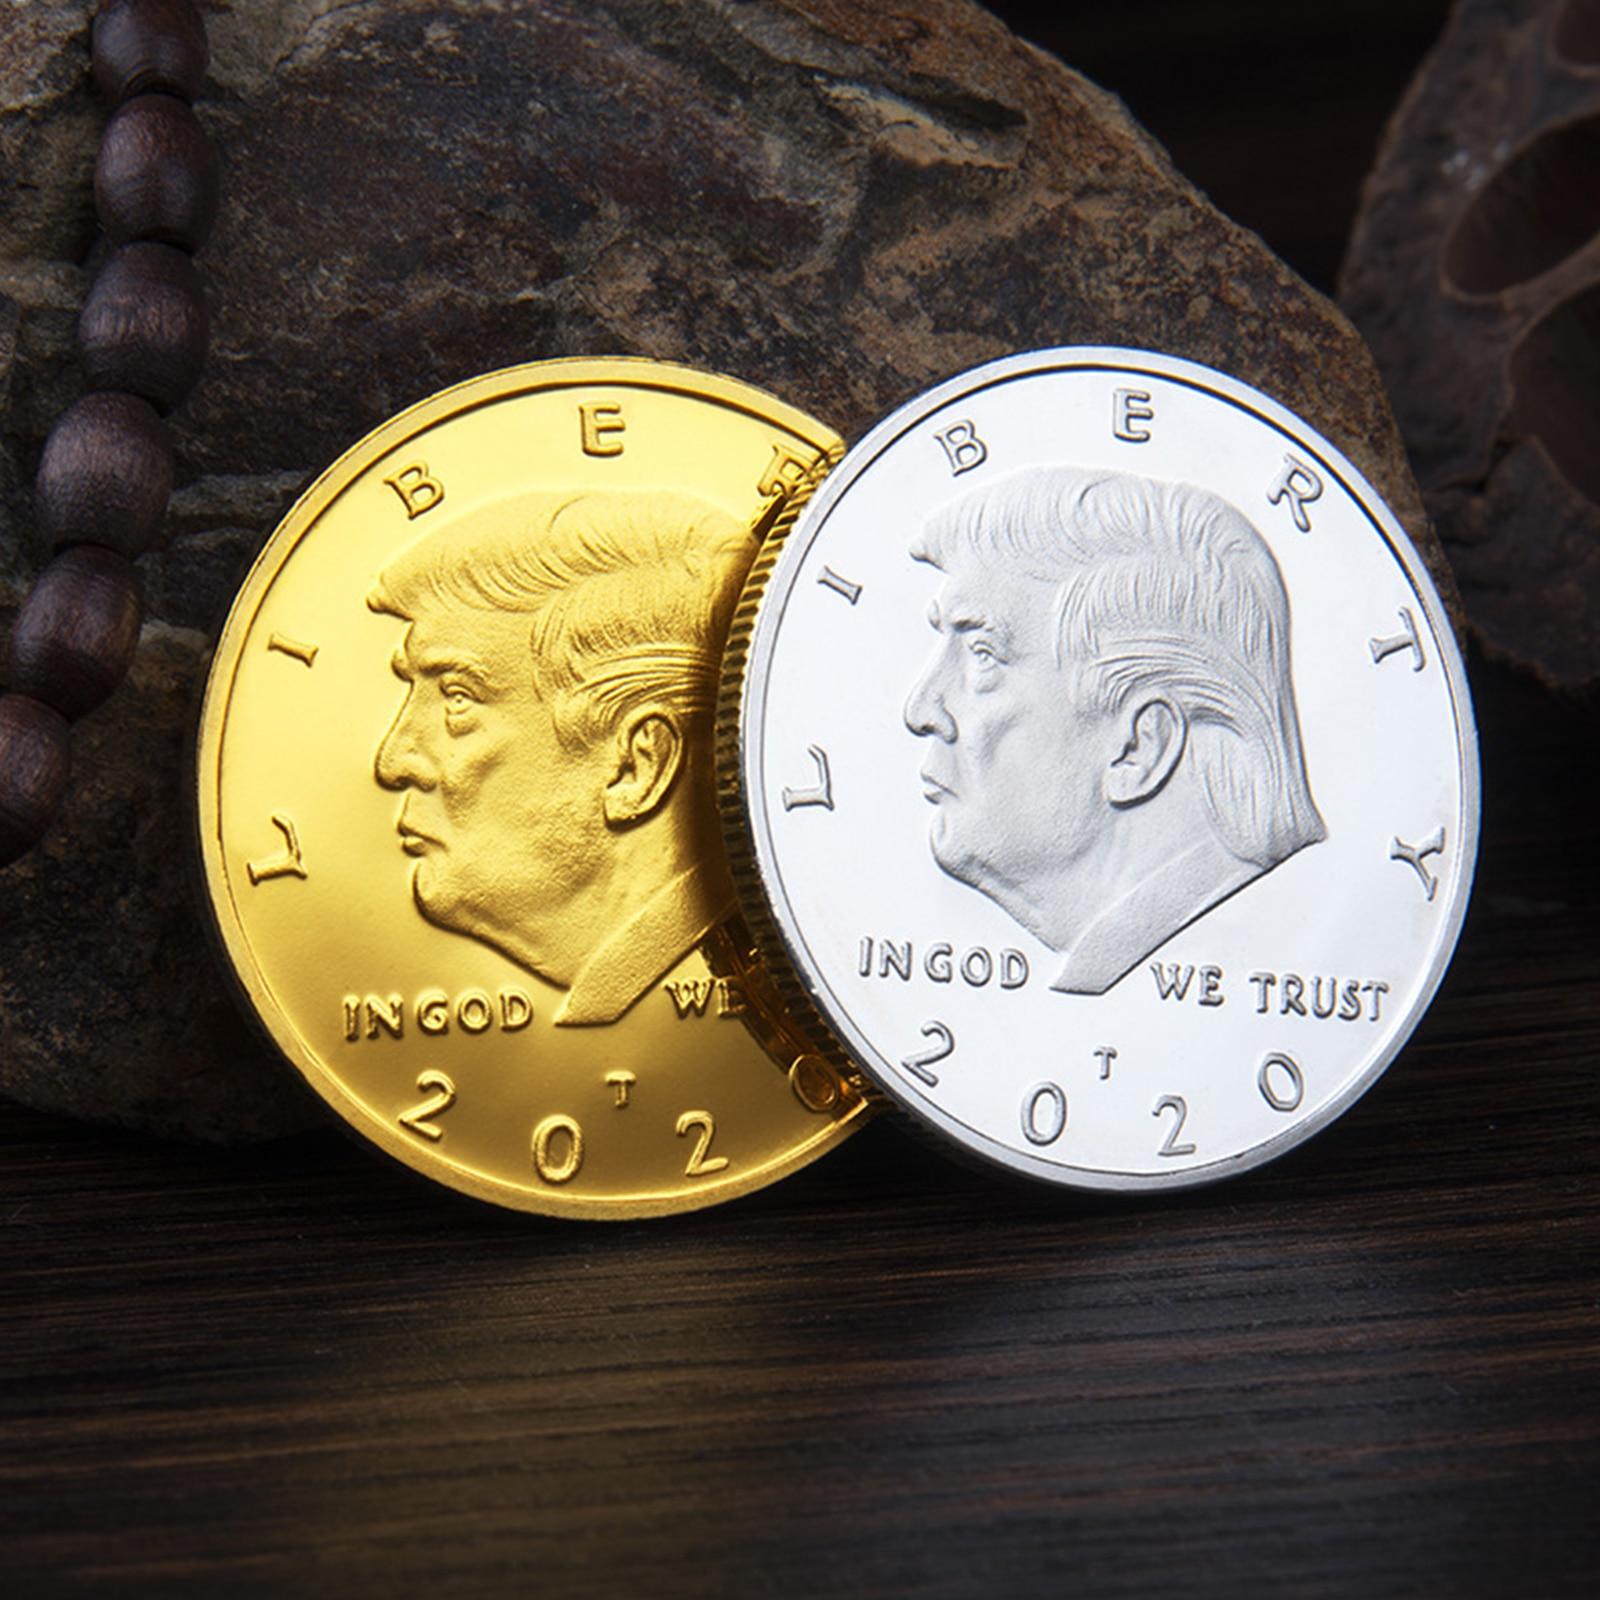 Areyourshop ouro prata chapeado moeda comemorativa eua donald trump 2020 liberdade dropshipping